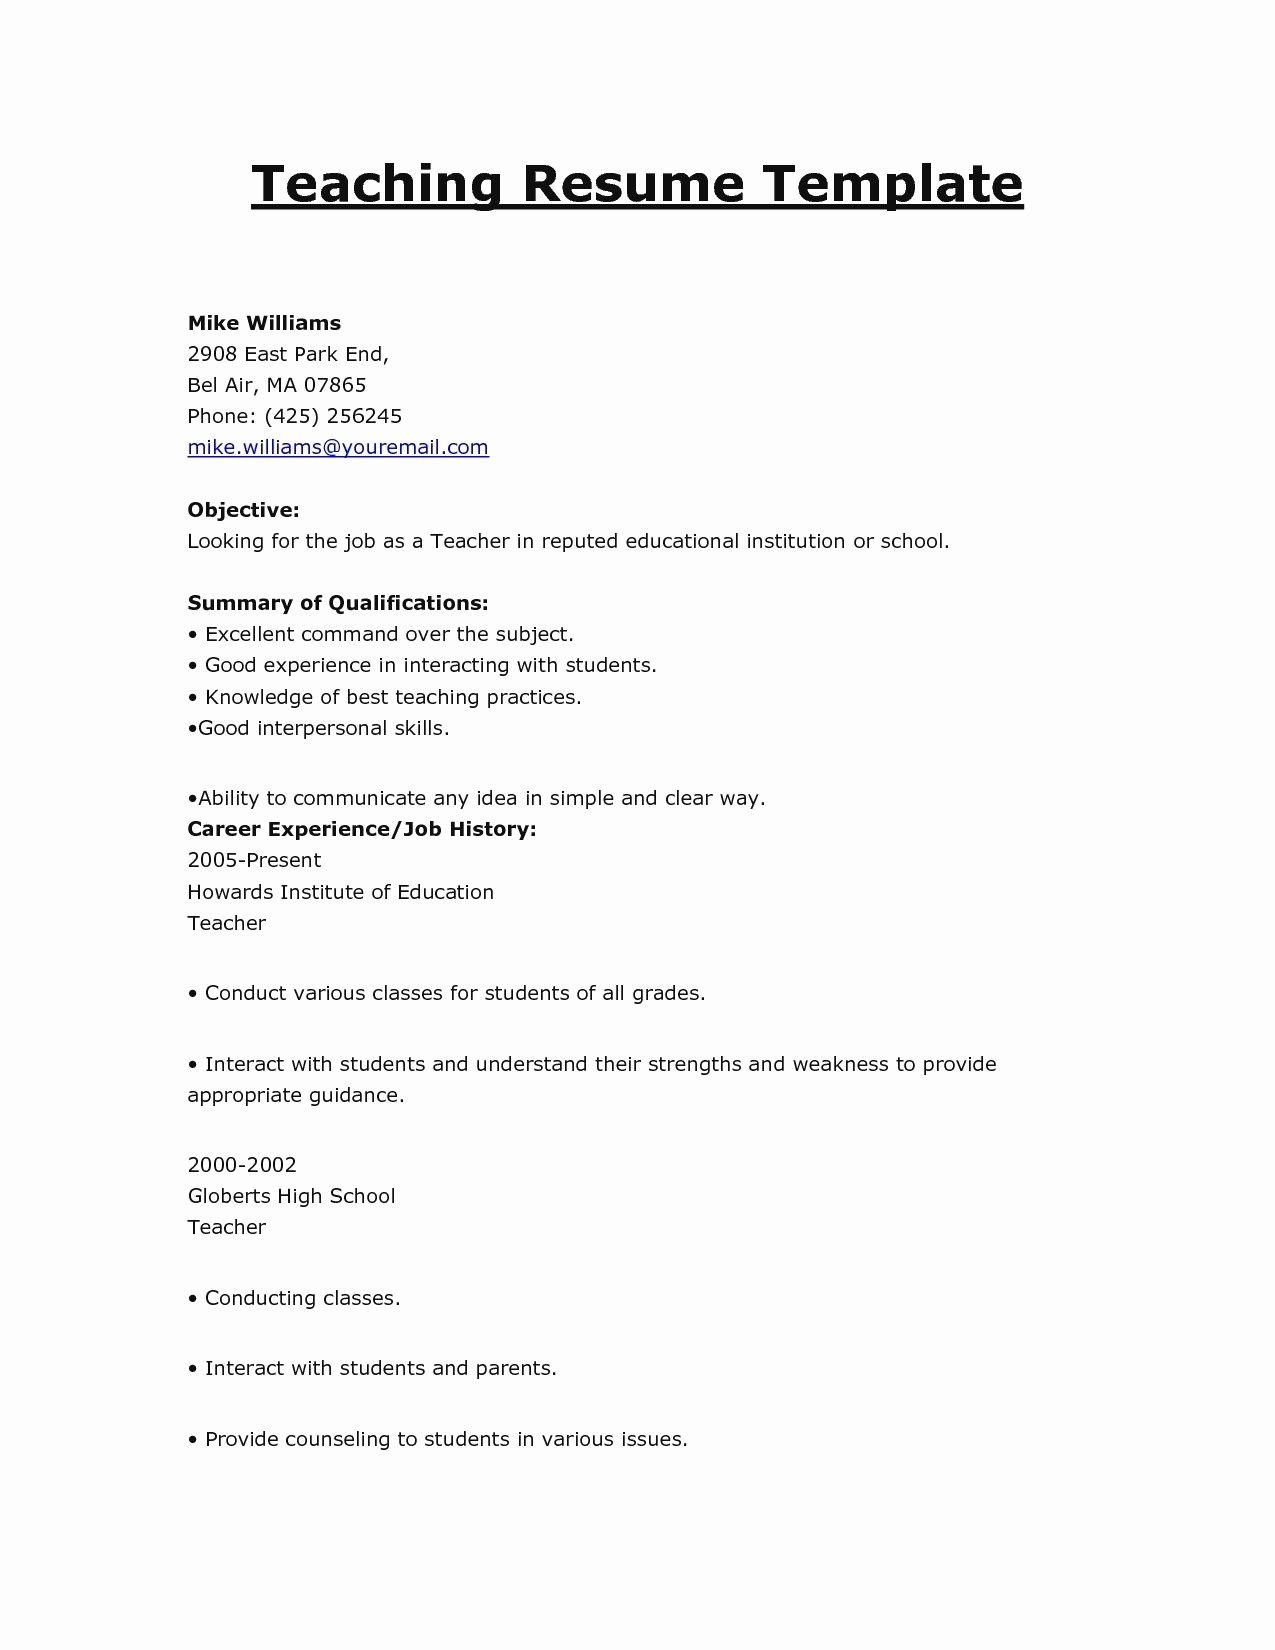 Resume Templates 2017 Reddit #reddit #resume #ResumeTemplates #templates